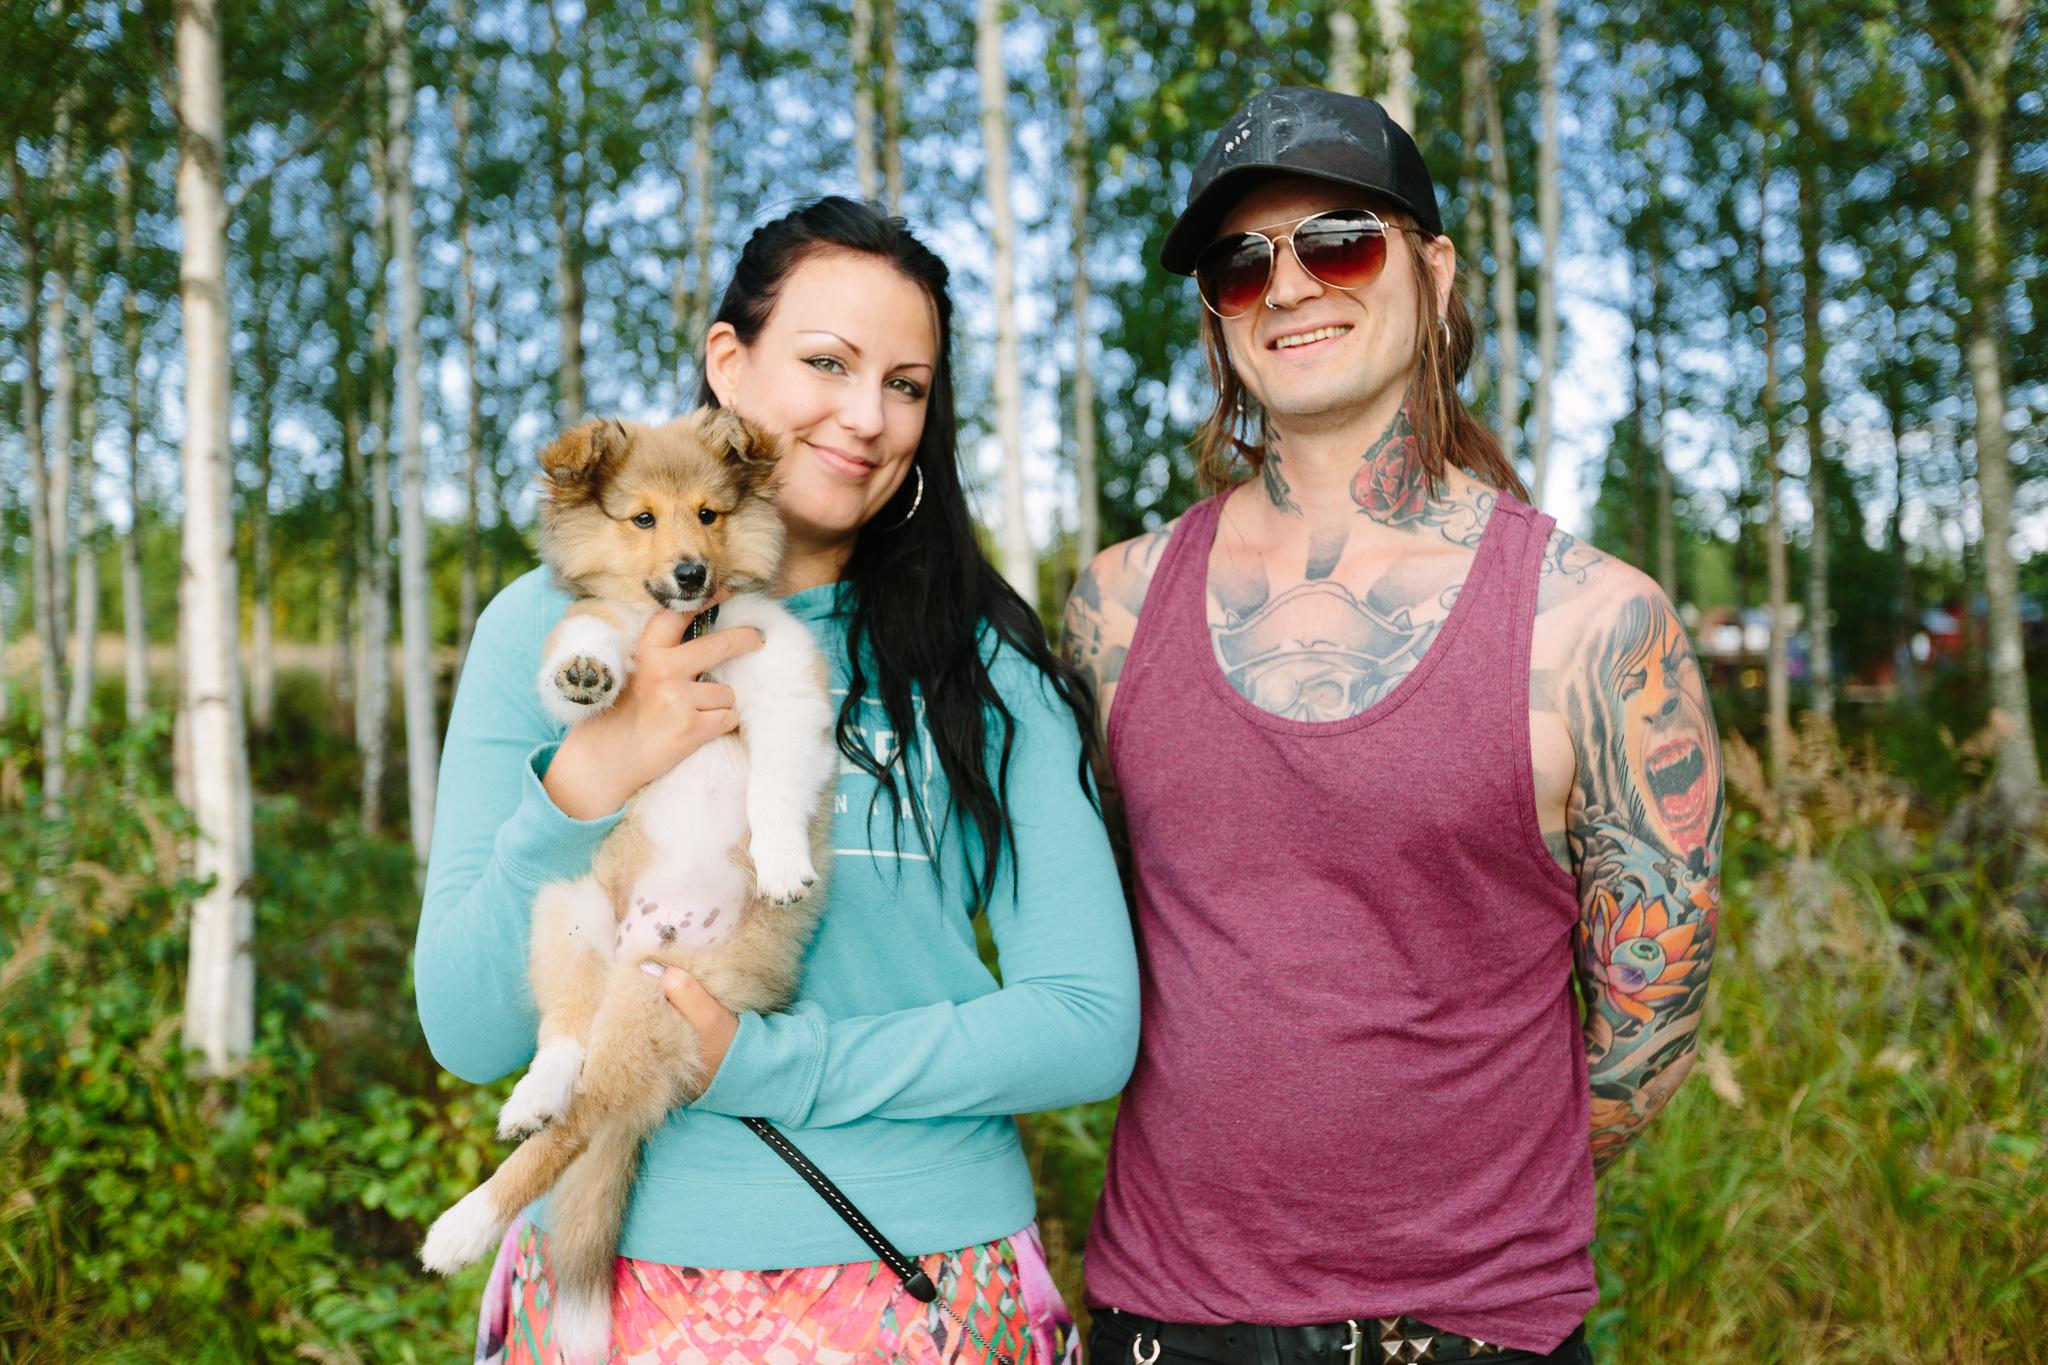 Sweden_Day2&3_blogselects_2016_jenniferleahyphotography-008.jpg